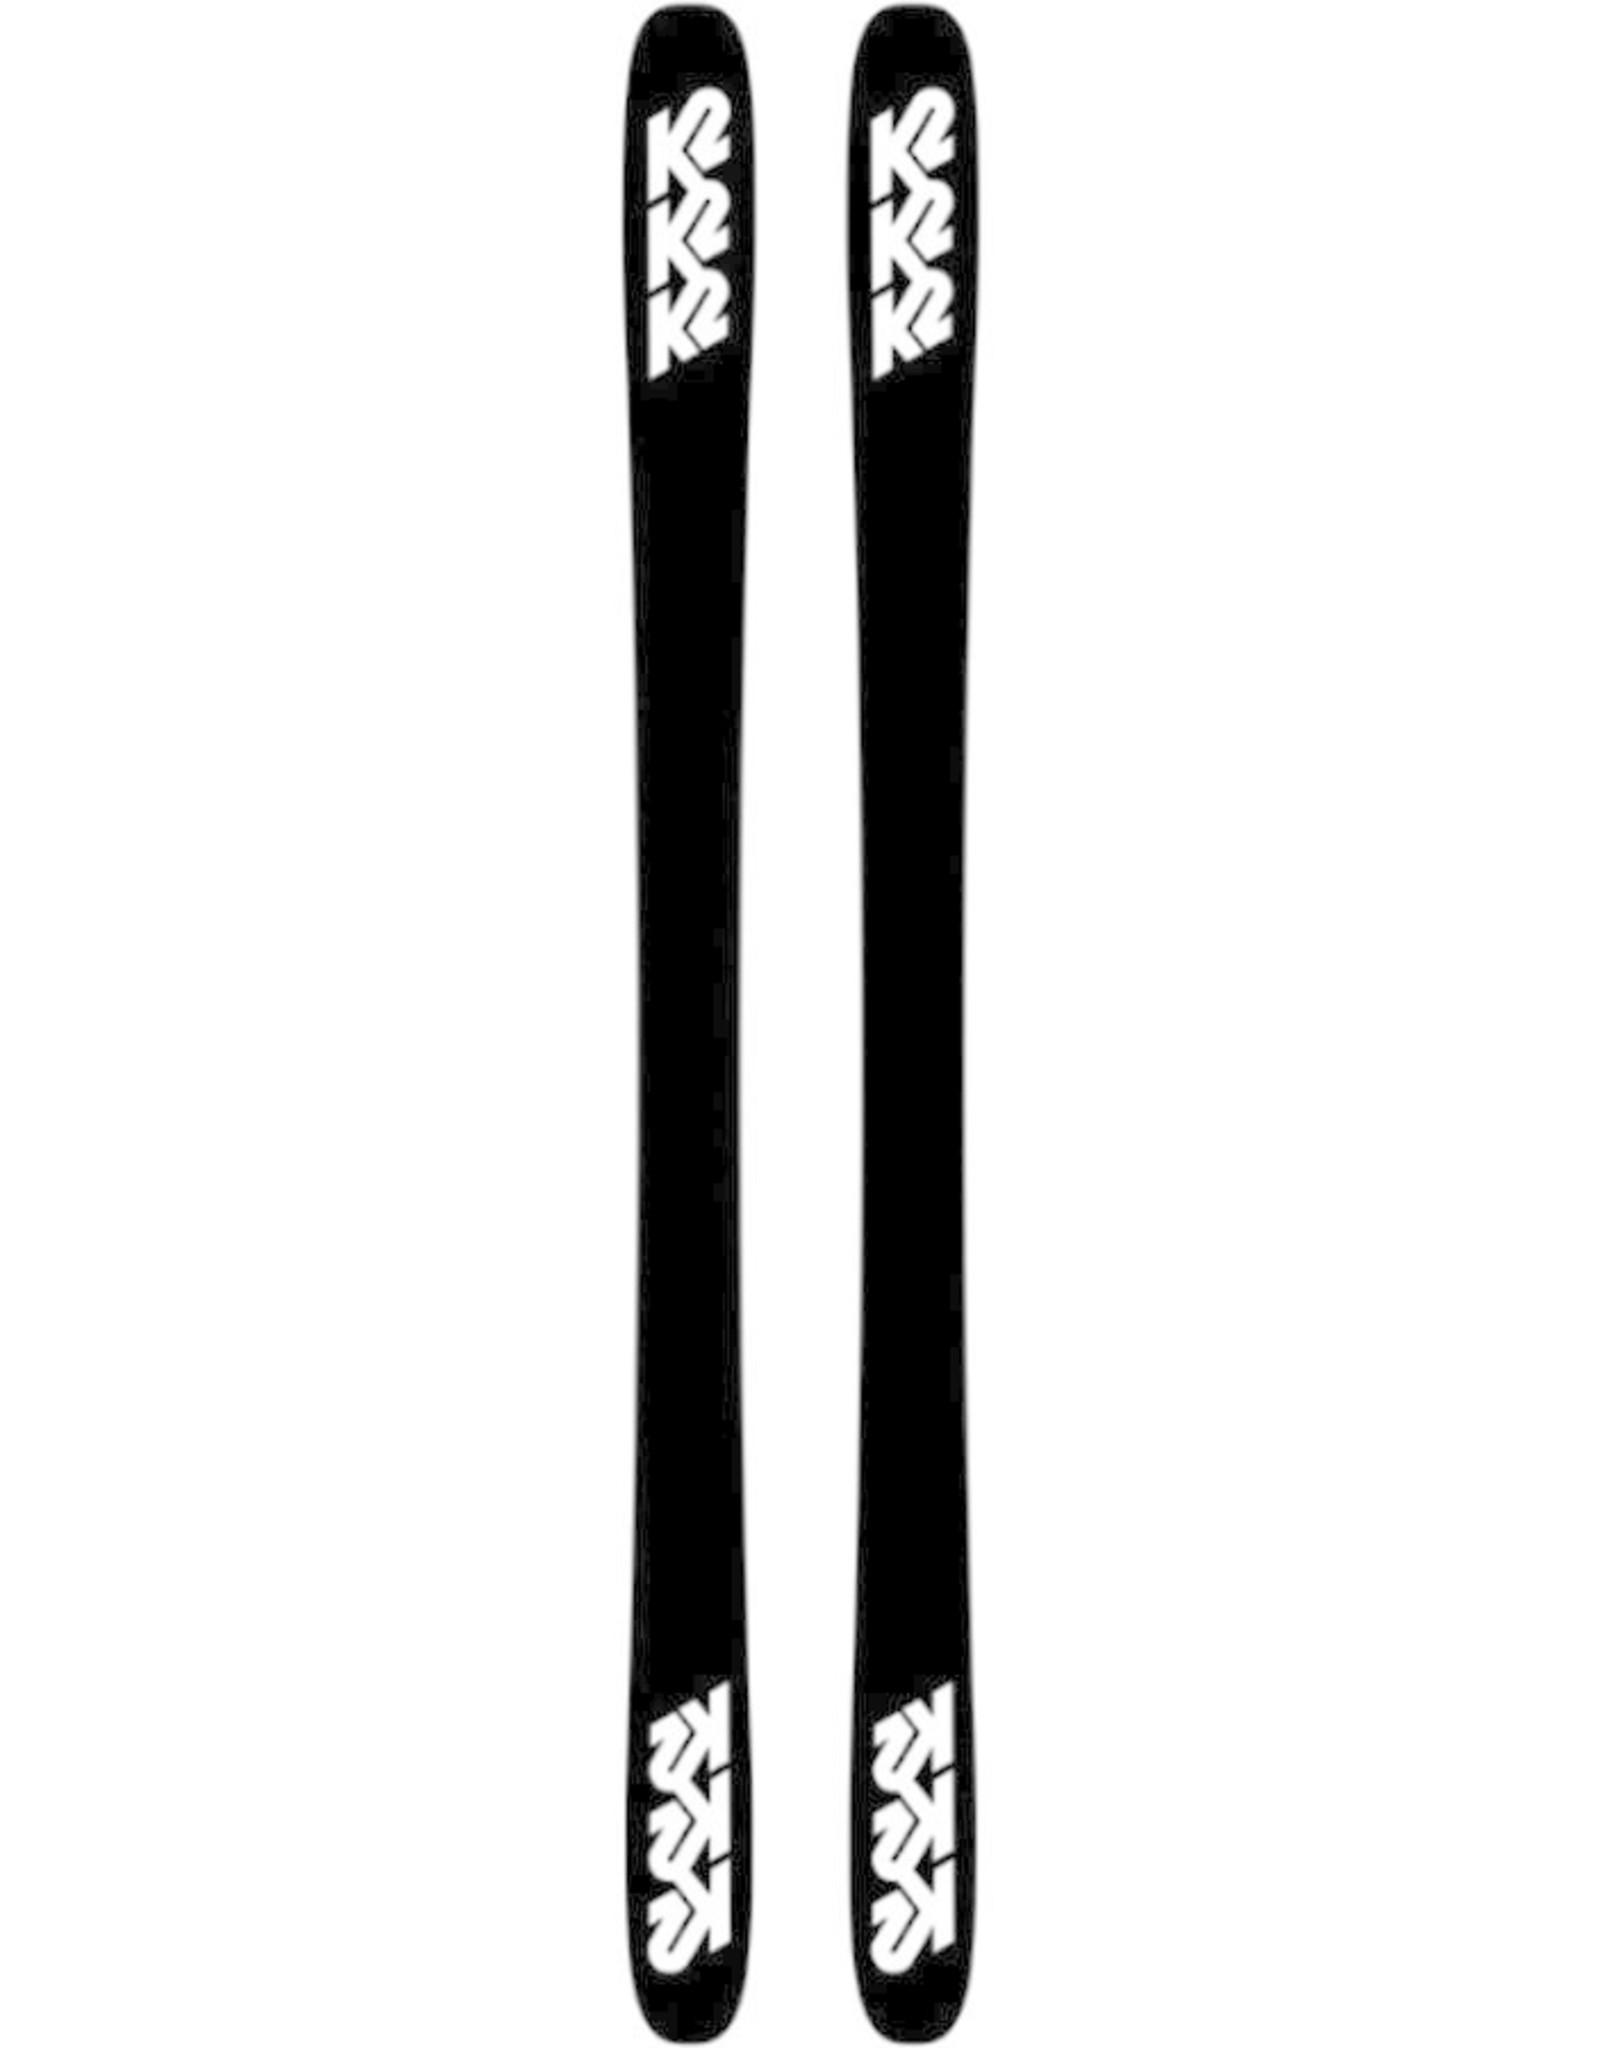 K2 K2 Skis EMPRESS (20/21)